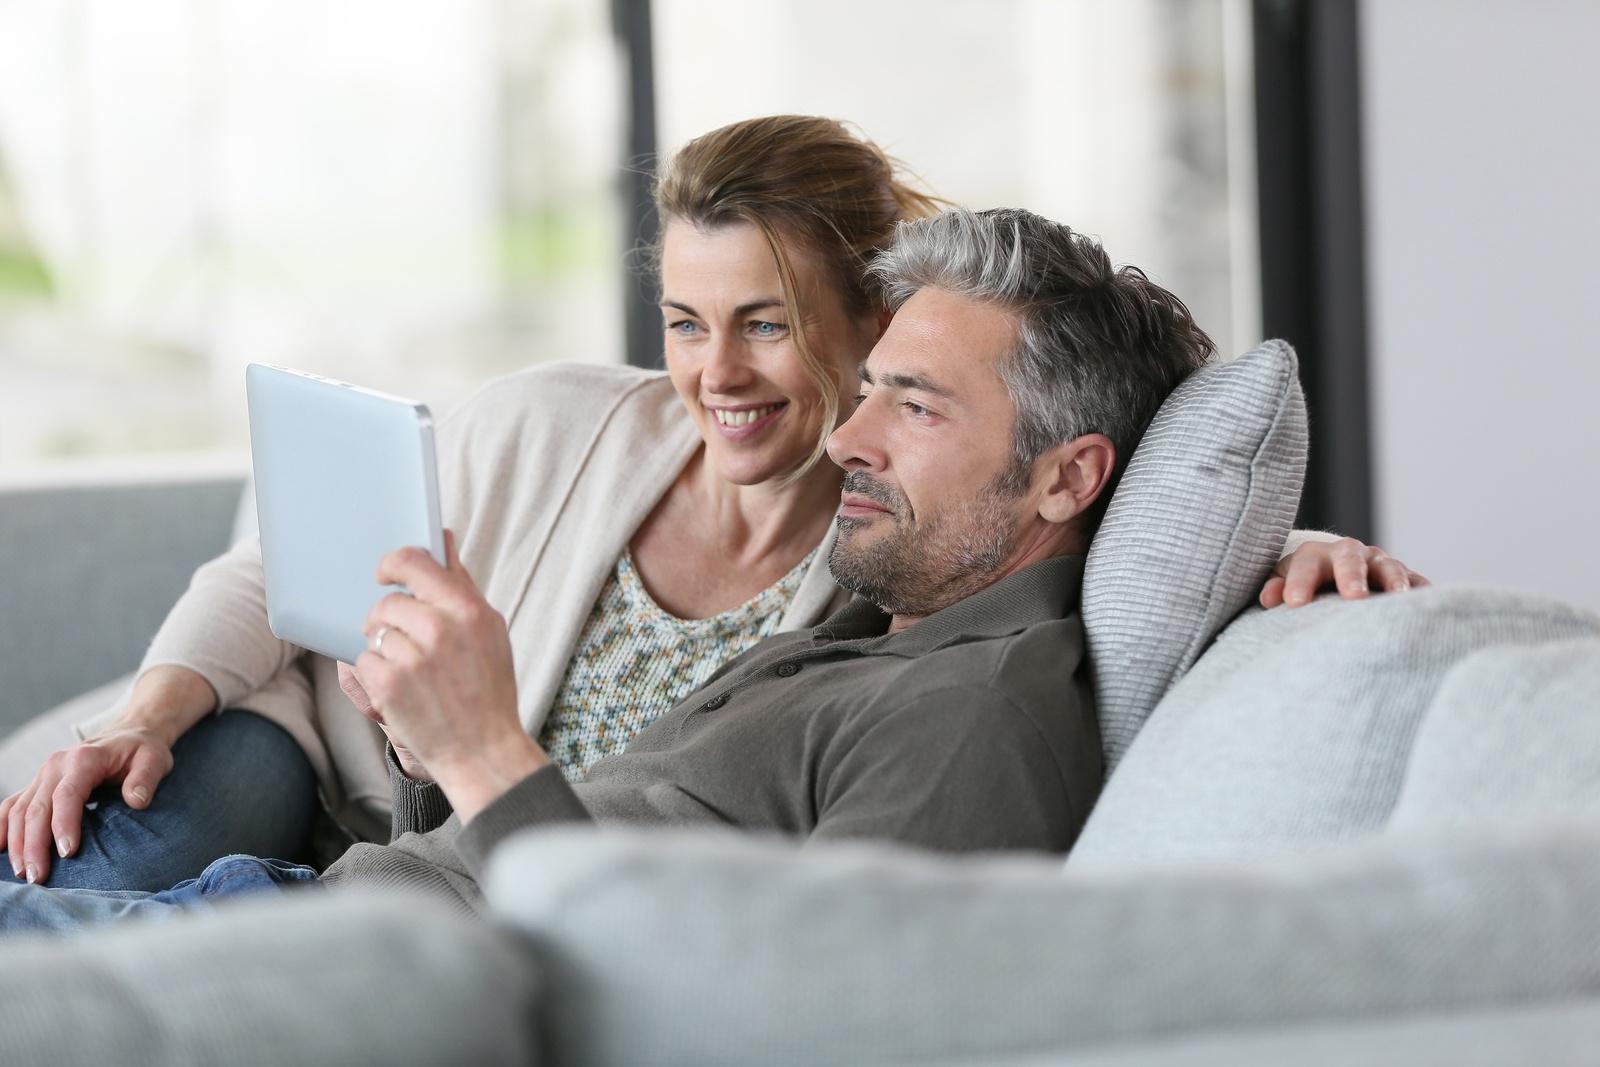 bigstock-Mature-couple-using-digital-ta-87394079